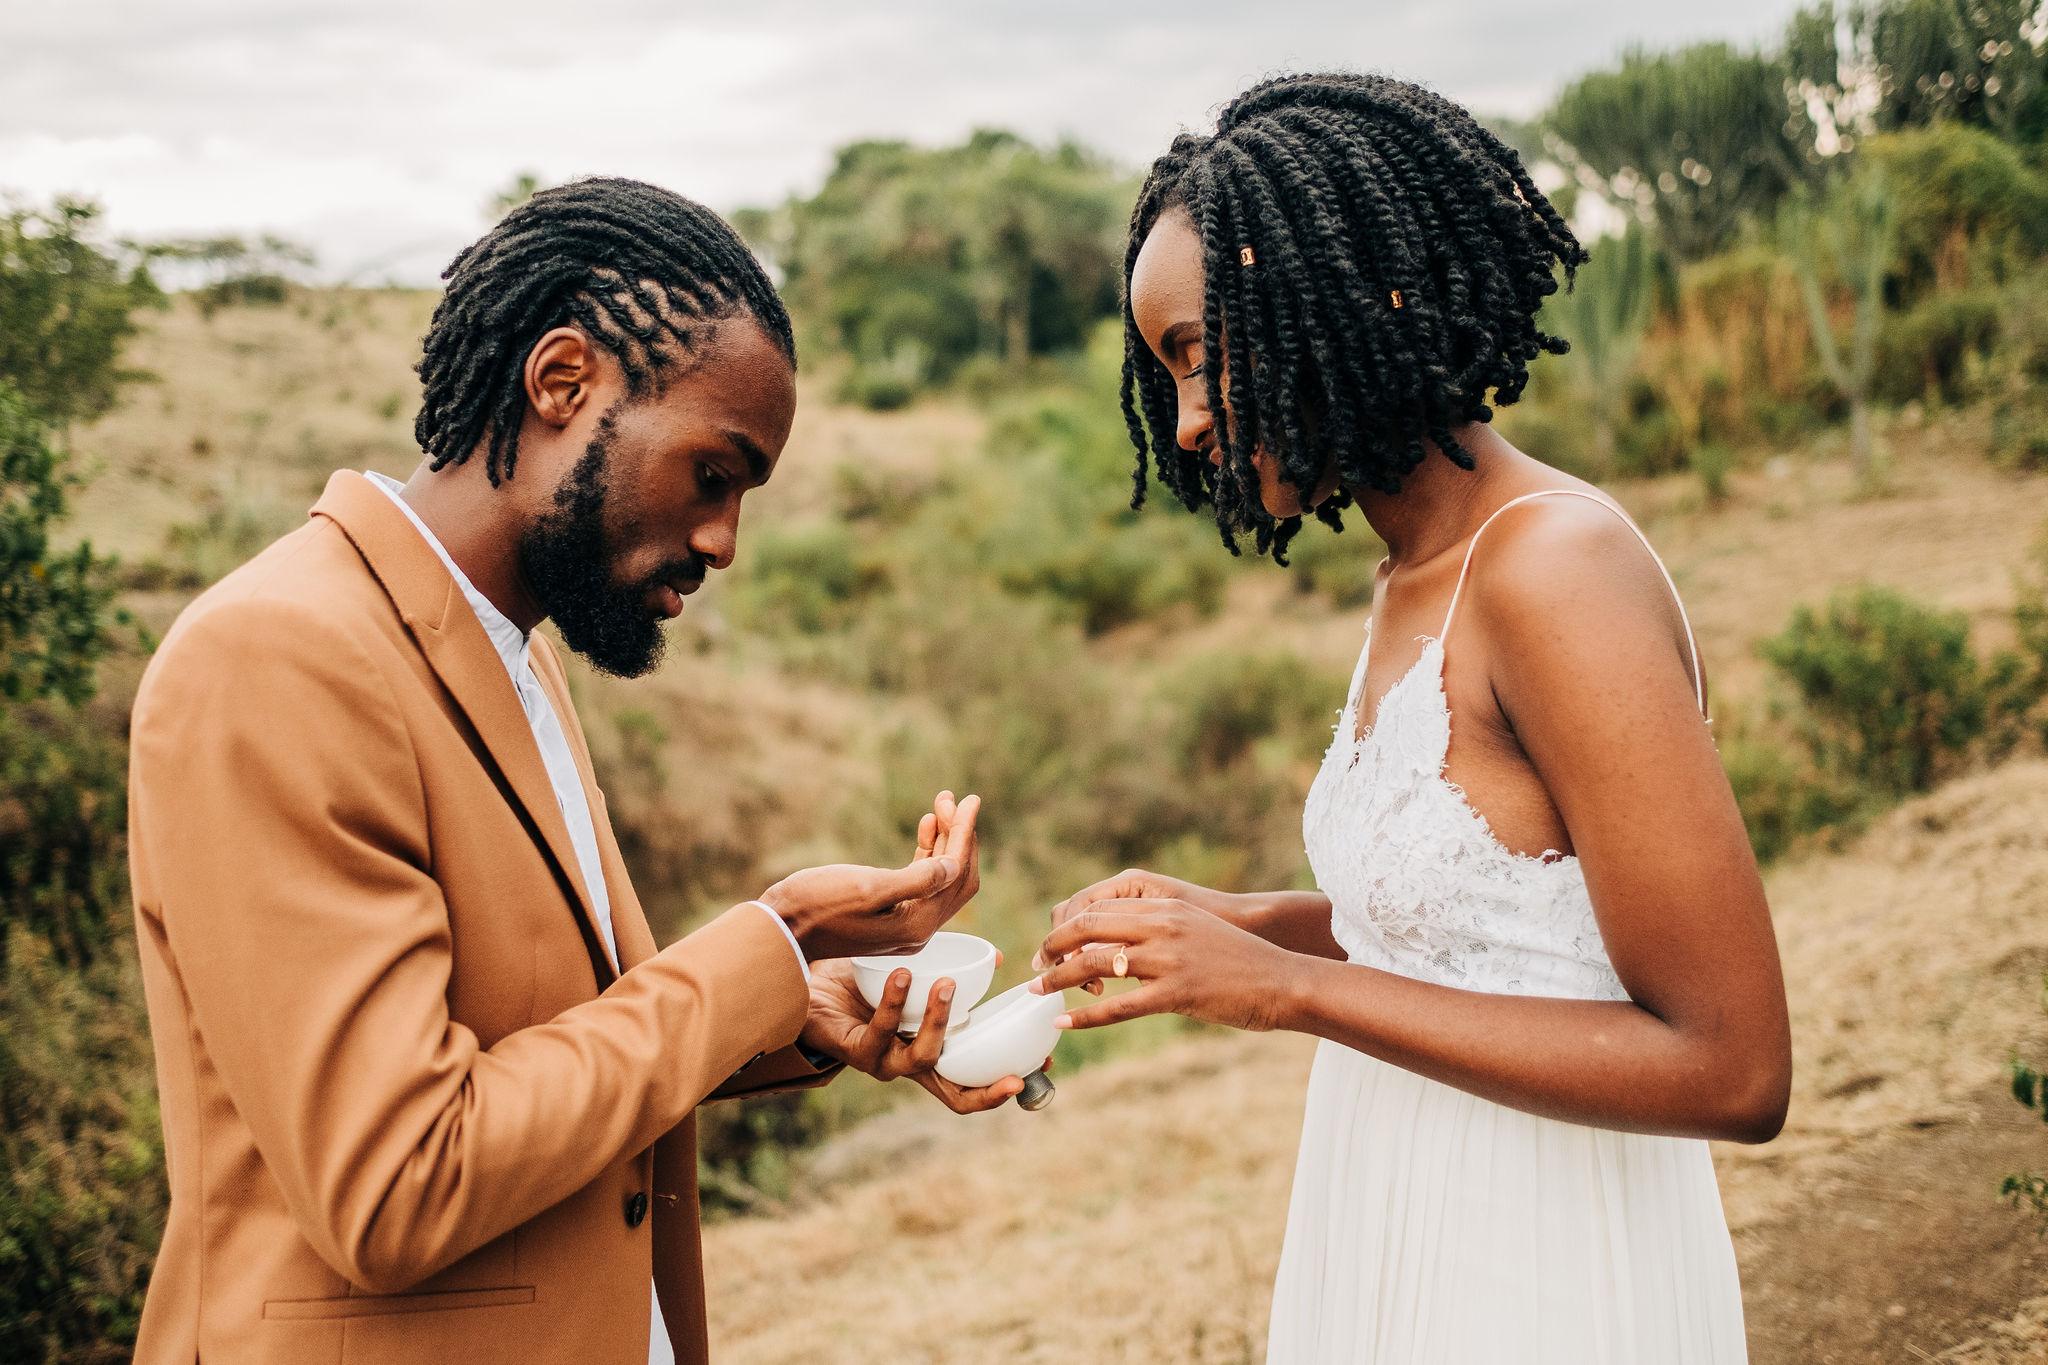 Anna-Hari-Photography-Destination-Wedding-Photographer-Kenya-165.jpg